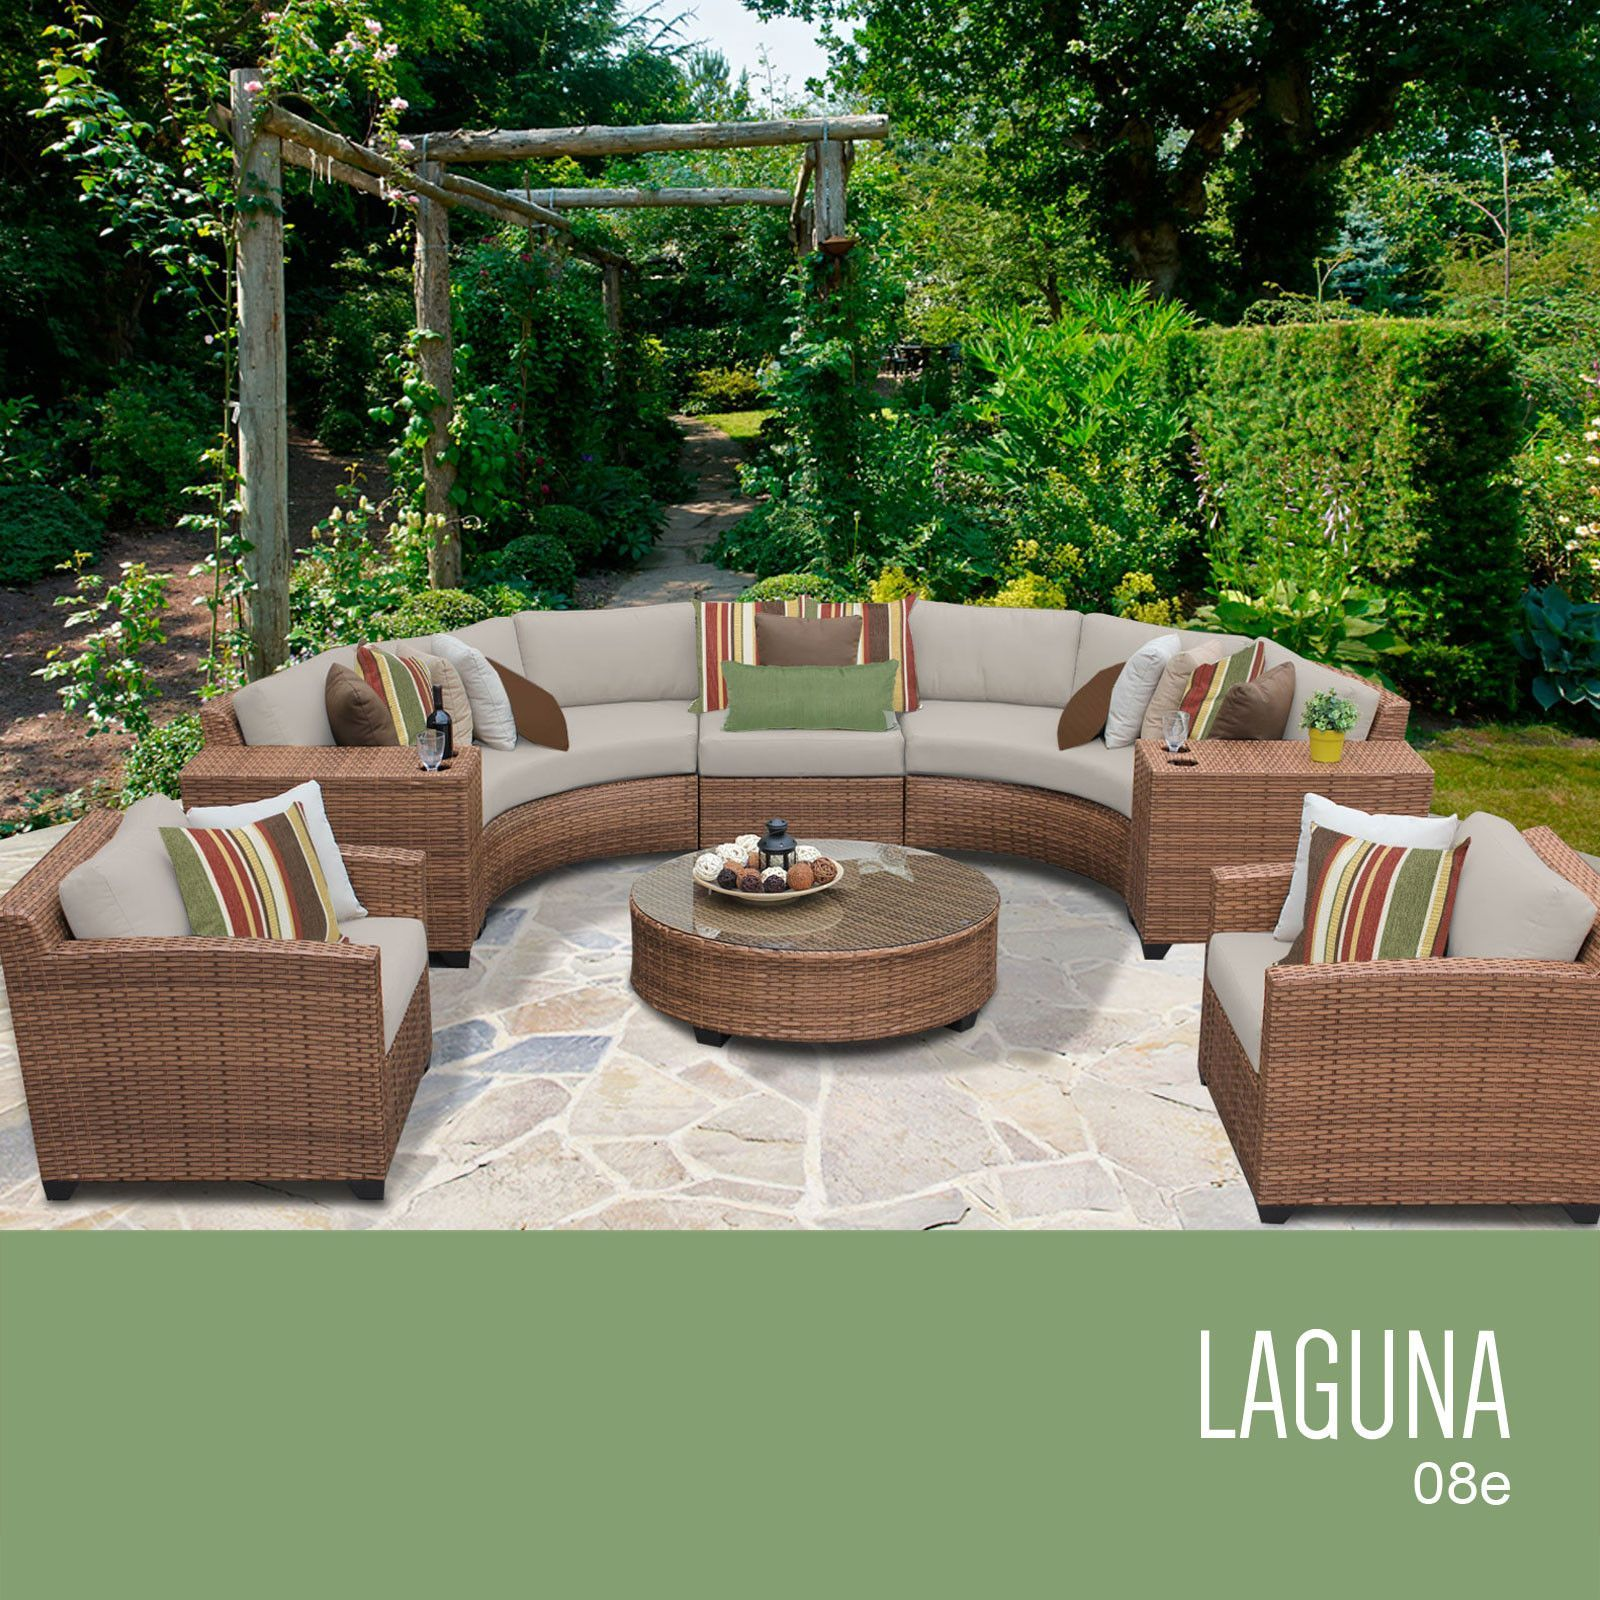 TKC Laguna 8 Piece Outdoor Wicker Patio Furniture Set 08e Beige